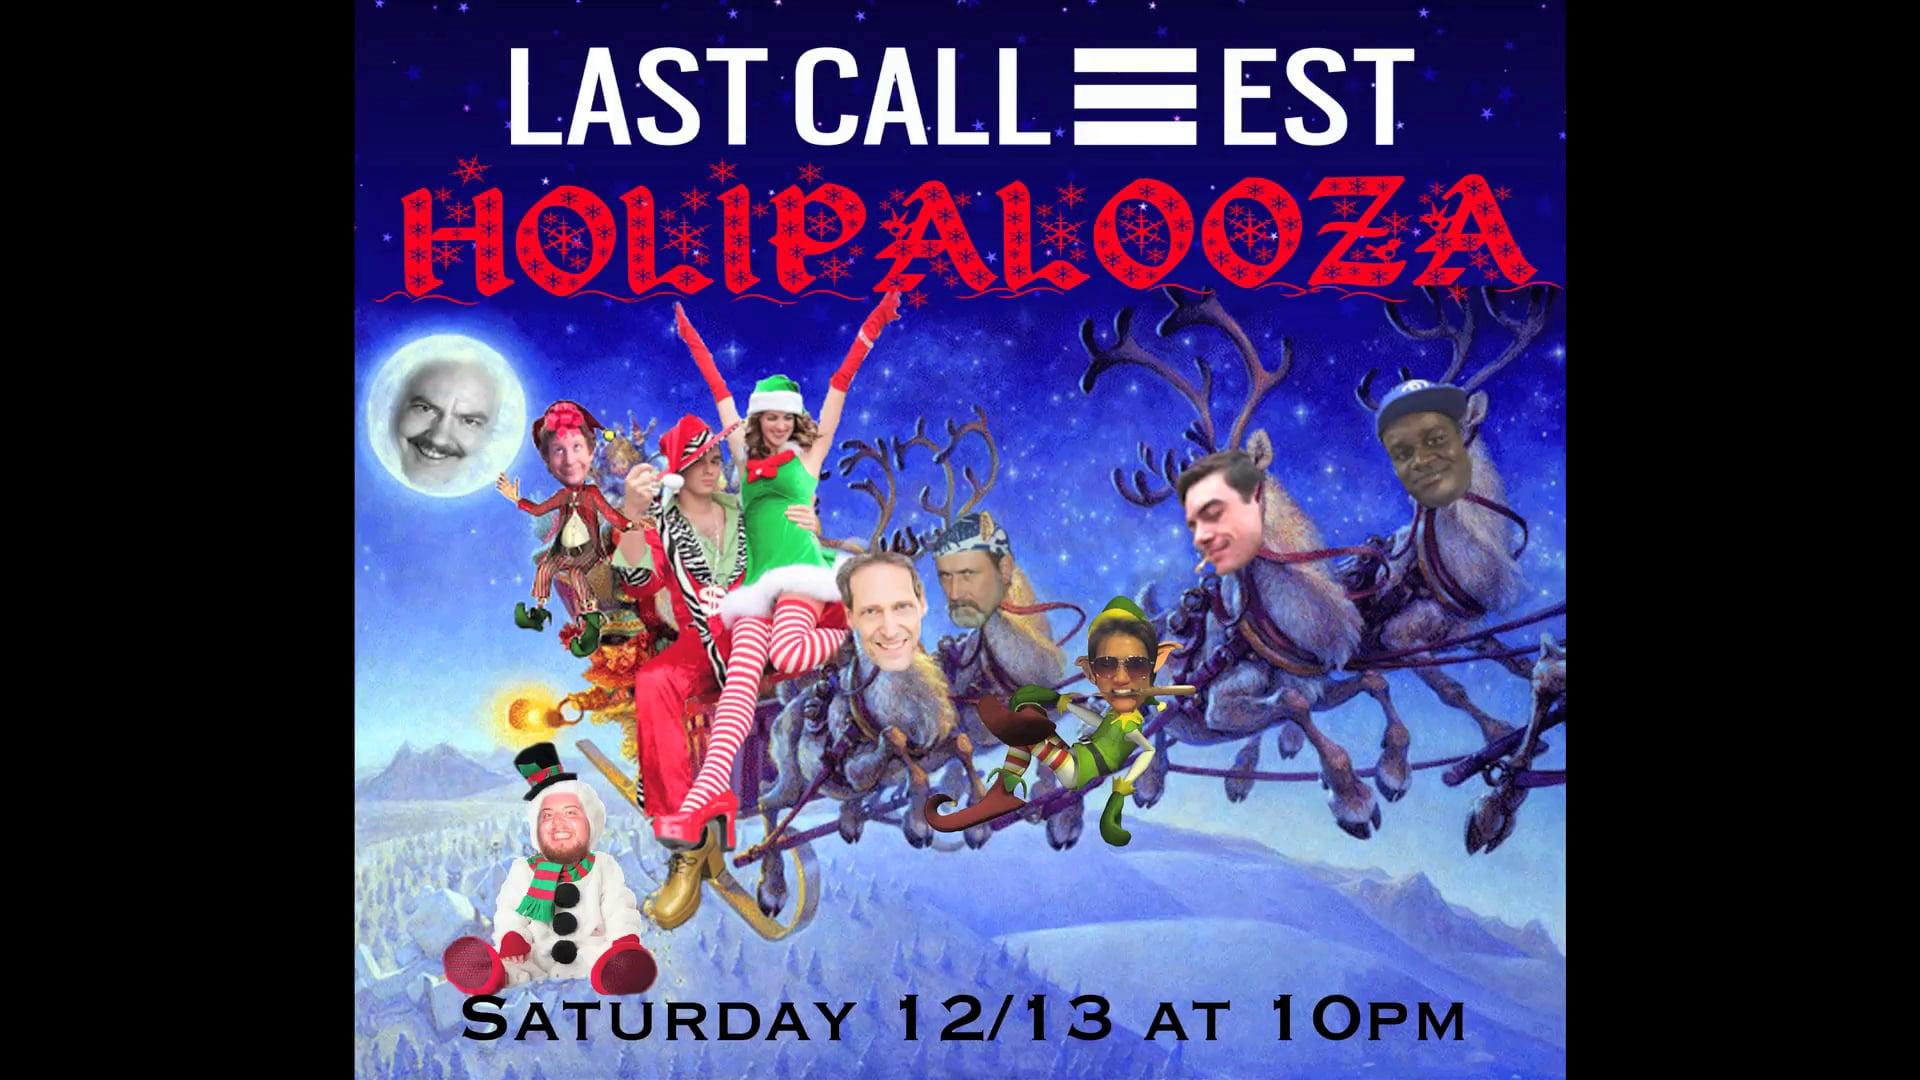 Holipalooza Last Call promo